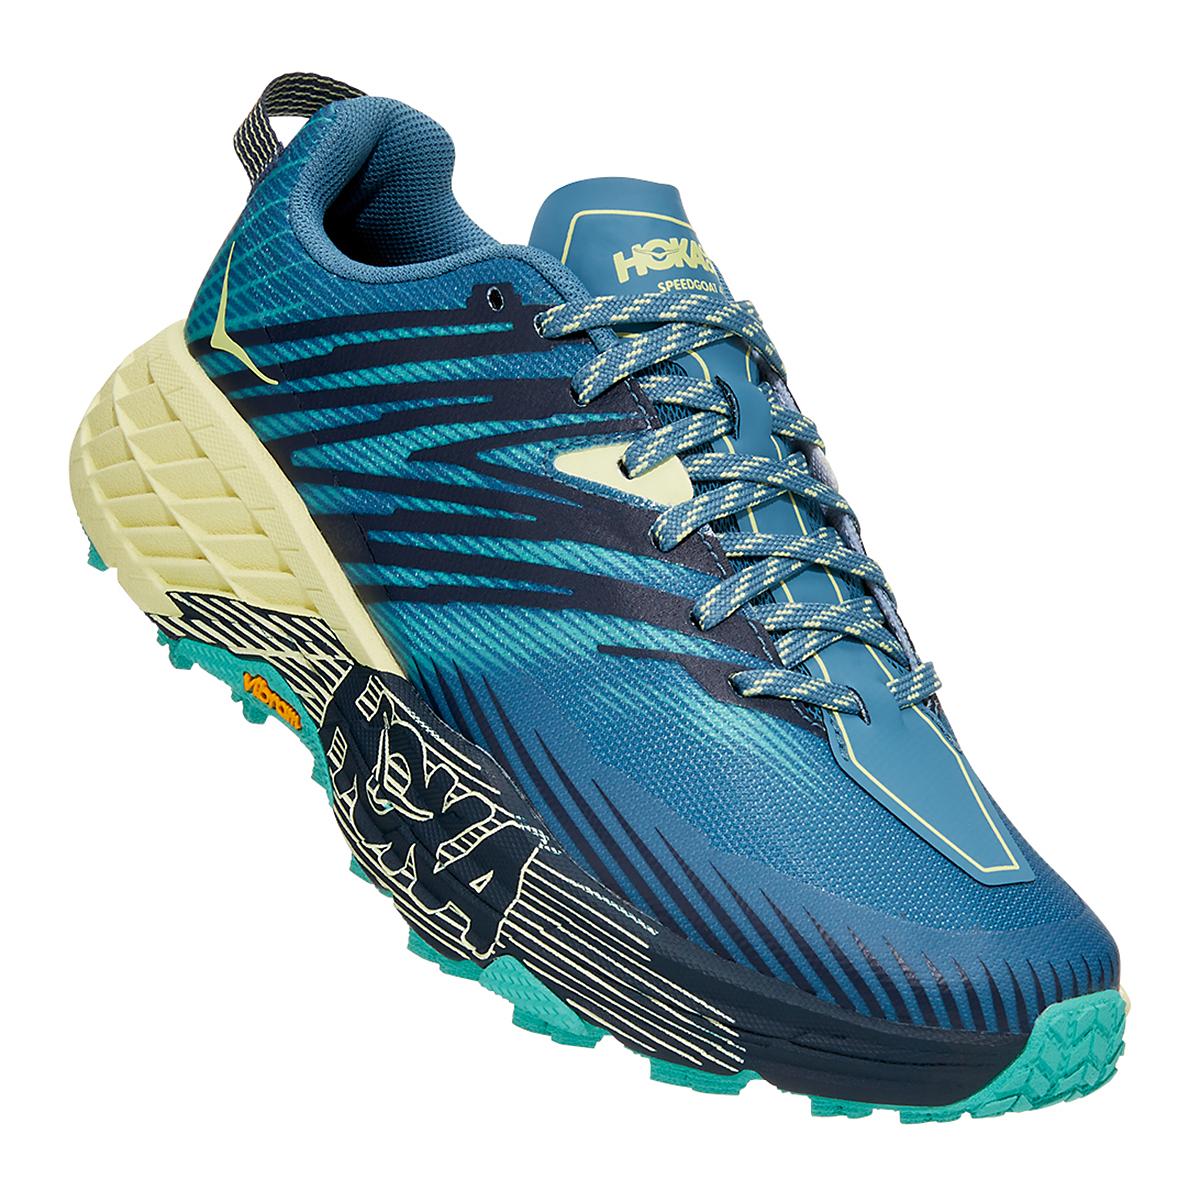 Women's Hoka One One Speedgoat 4 Running Shoe - Color: Provincial Blue/Luminary Green - Size: 5 - Width: Regular, Provincial Blue/Luminary Green, large, image 5